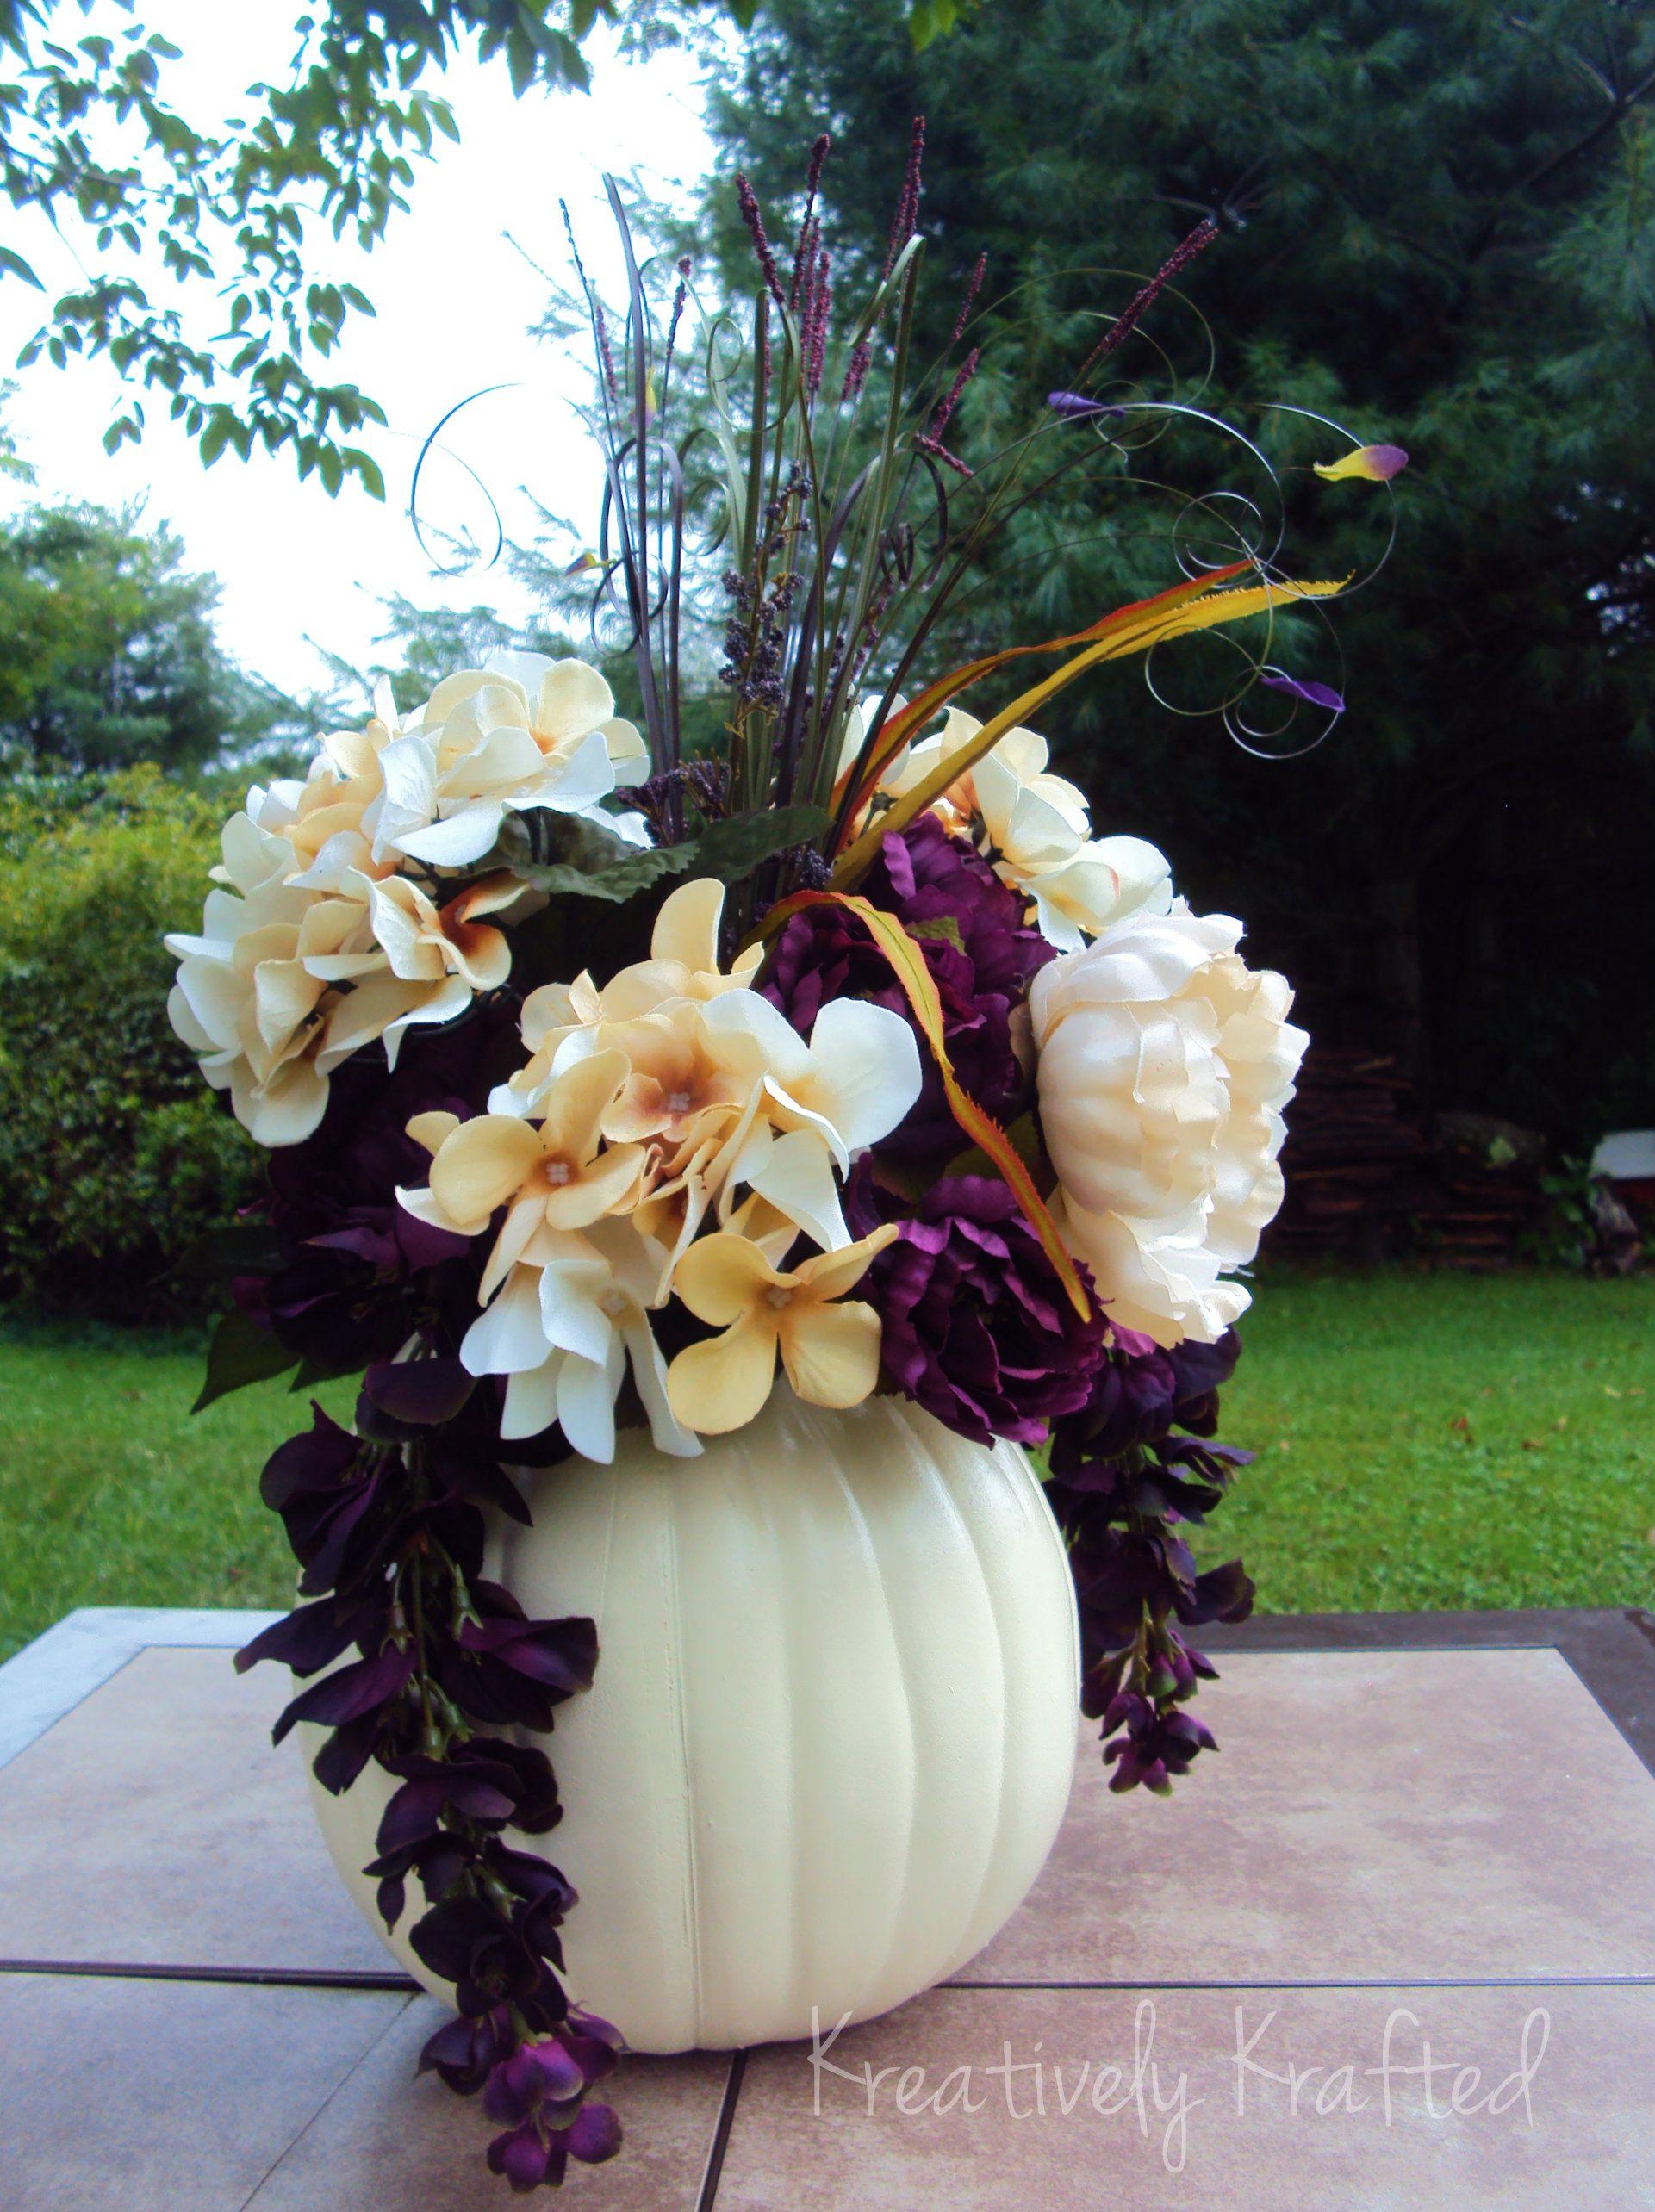 White / Cream & Purple Plum Eggplant Pumpkin Flower Table